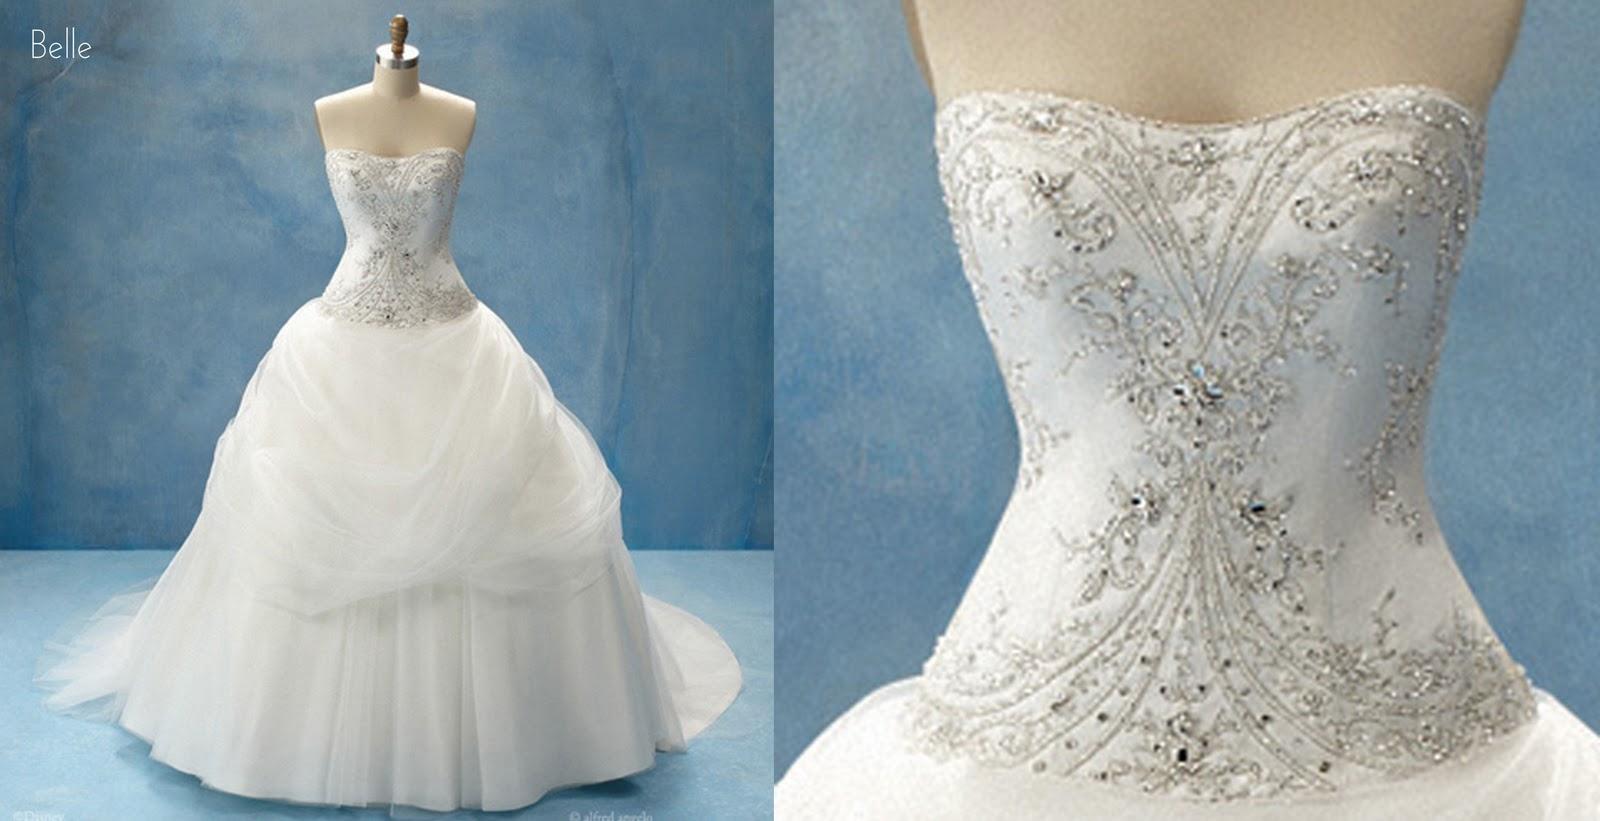 Robe de princesse blanche neige